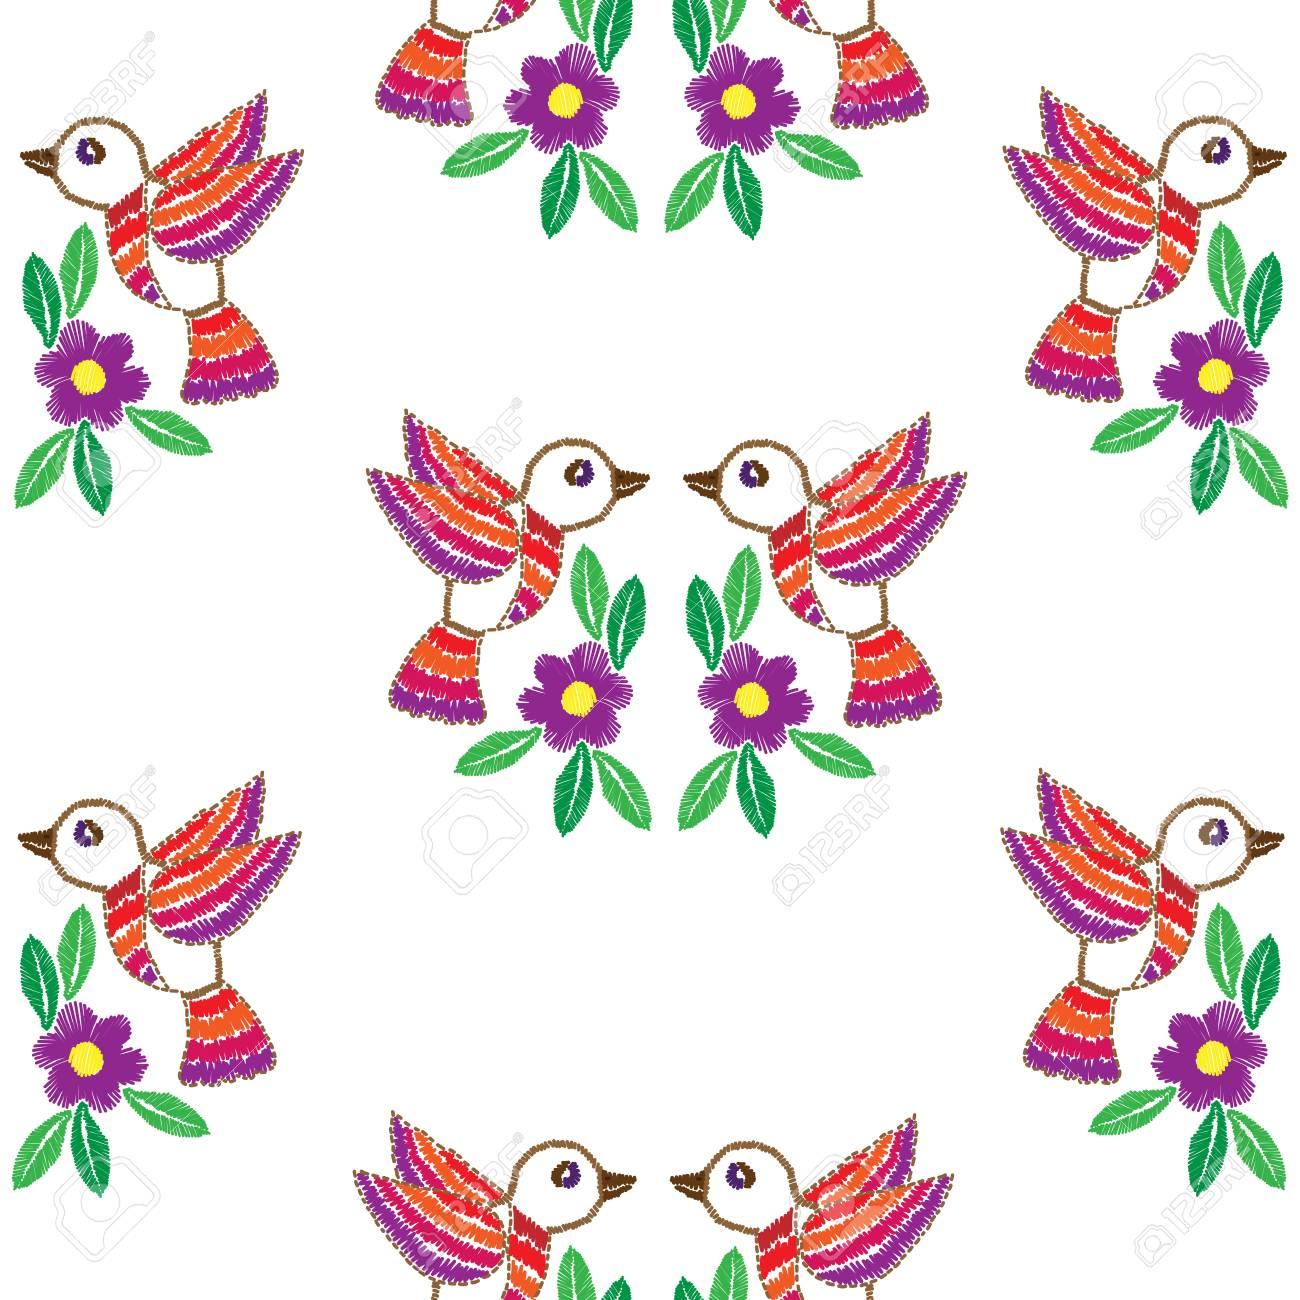 Patrón De Imitación De Bordado Inconsútil Con Aves Y Flores. Fondo ...